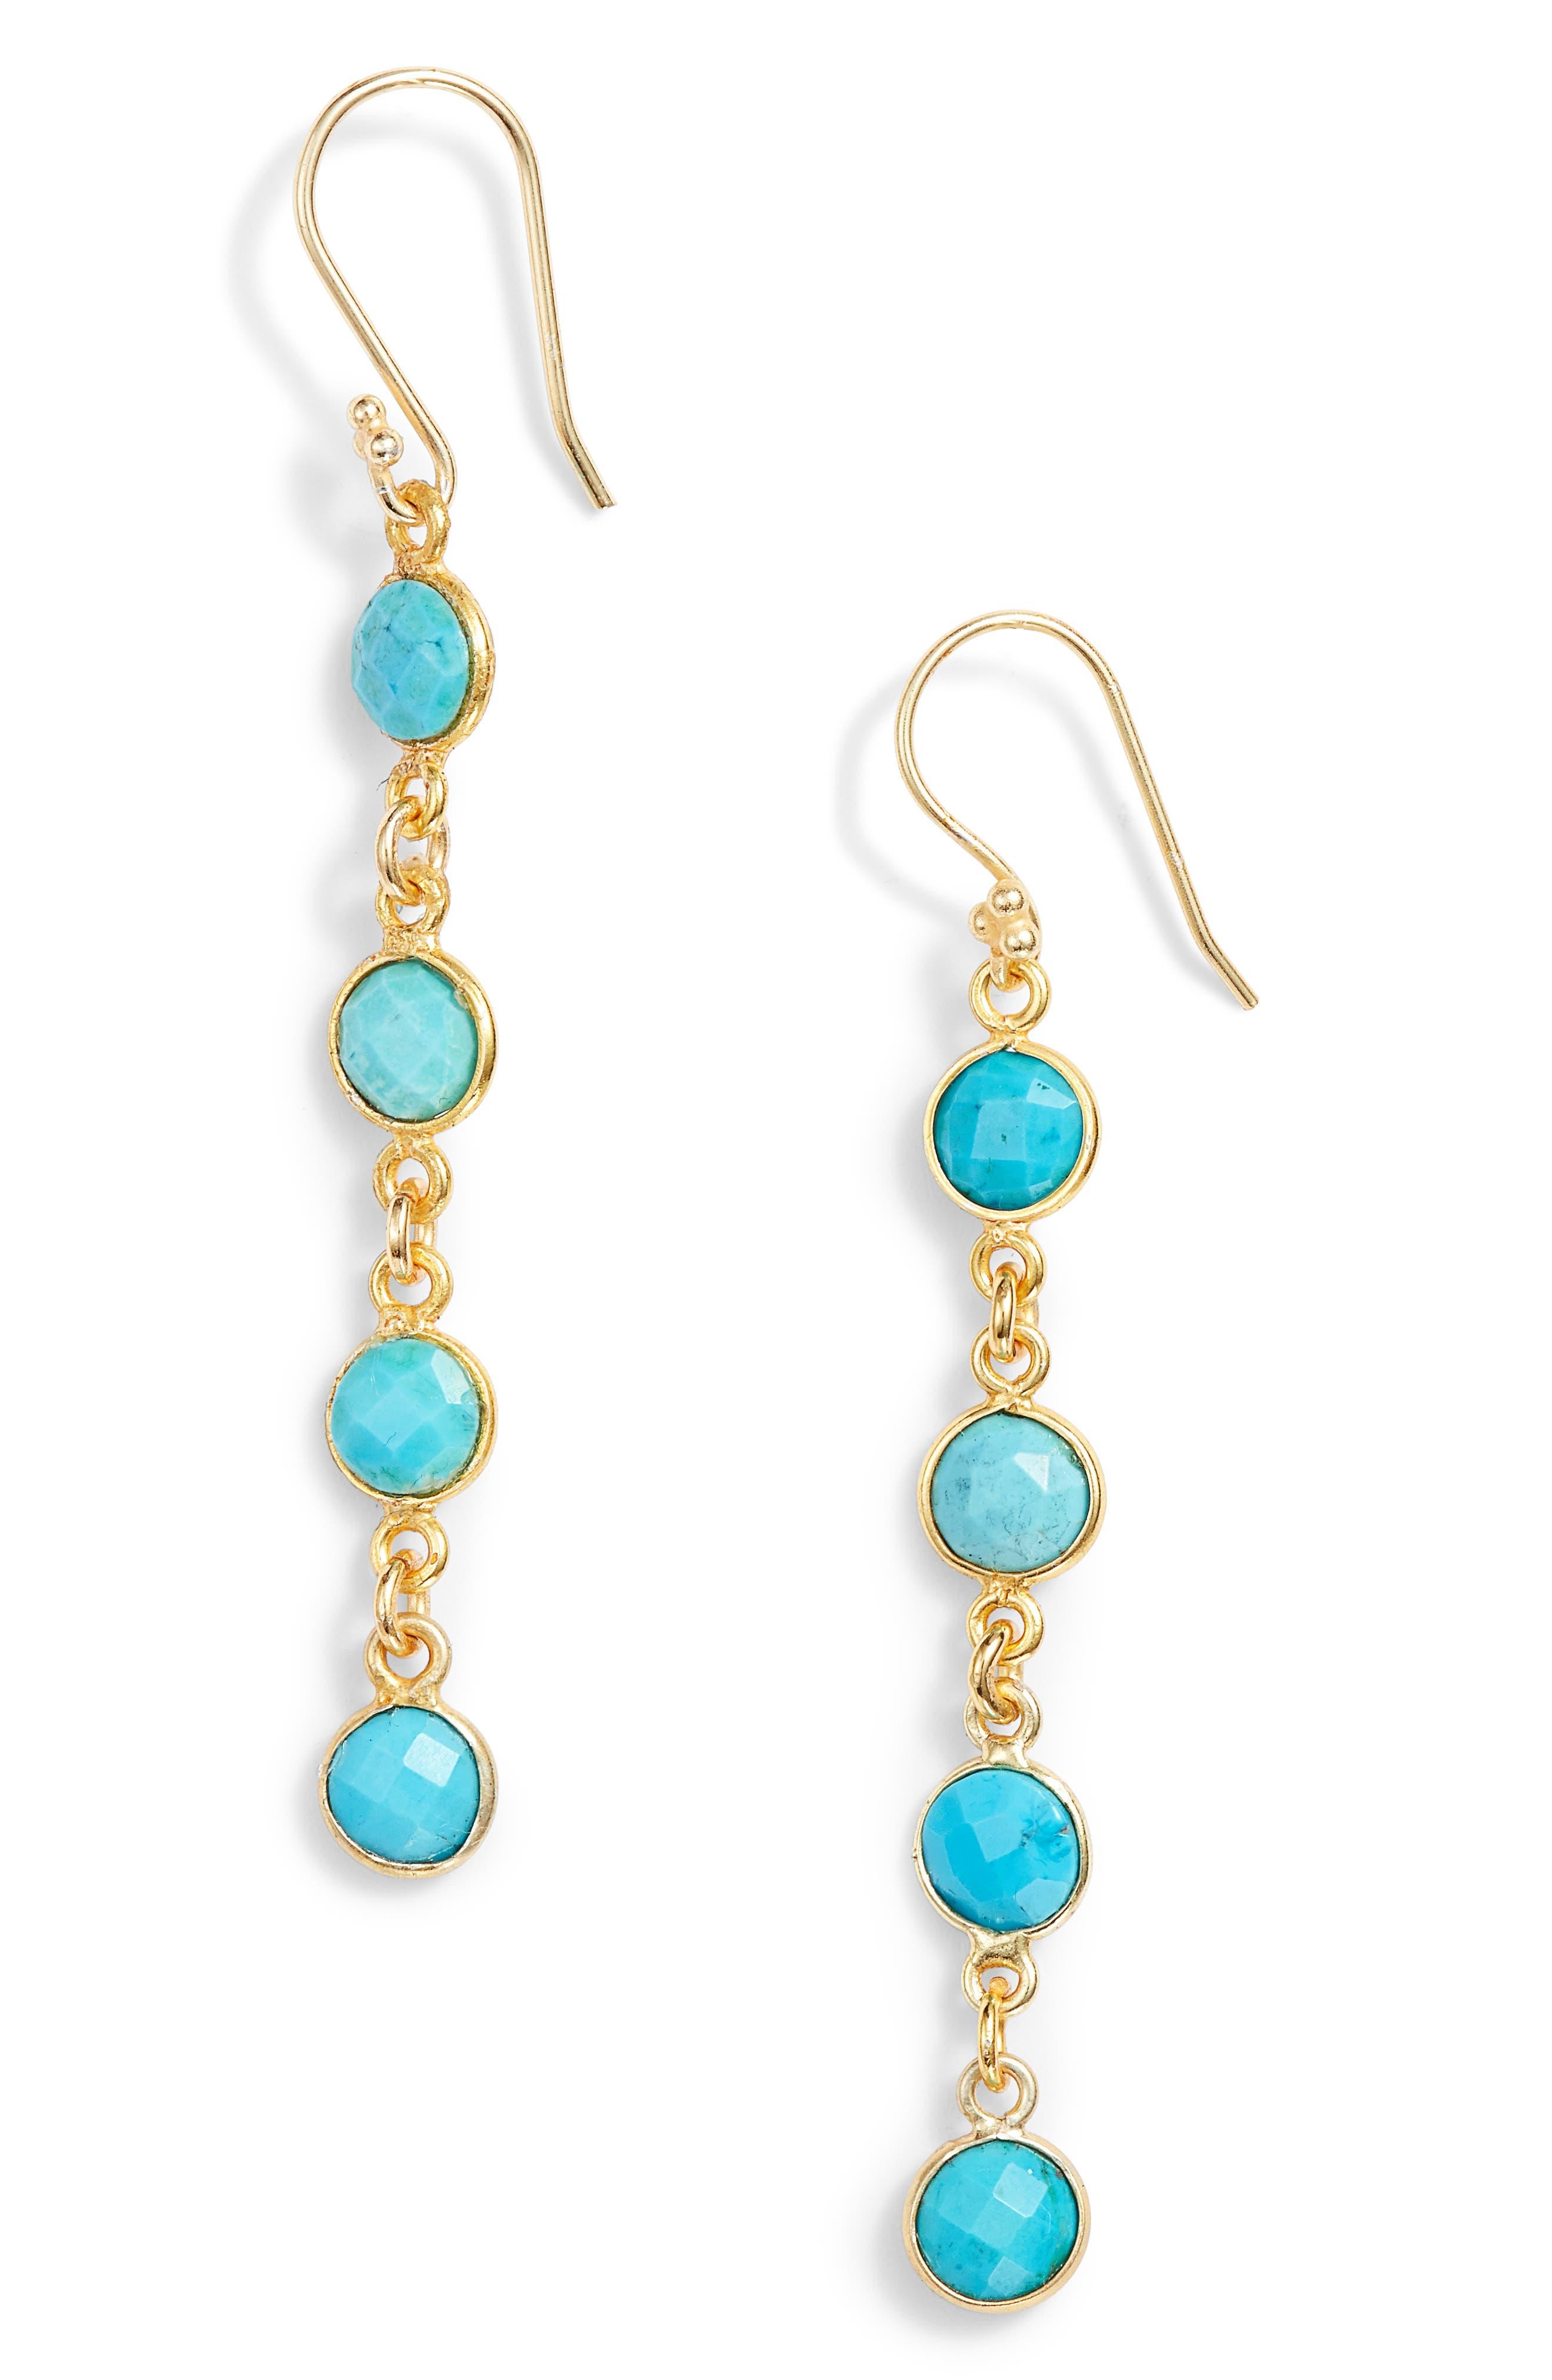 Stone Drop Earrings,                             Main thumbnail 1, color,                             Turquoise